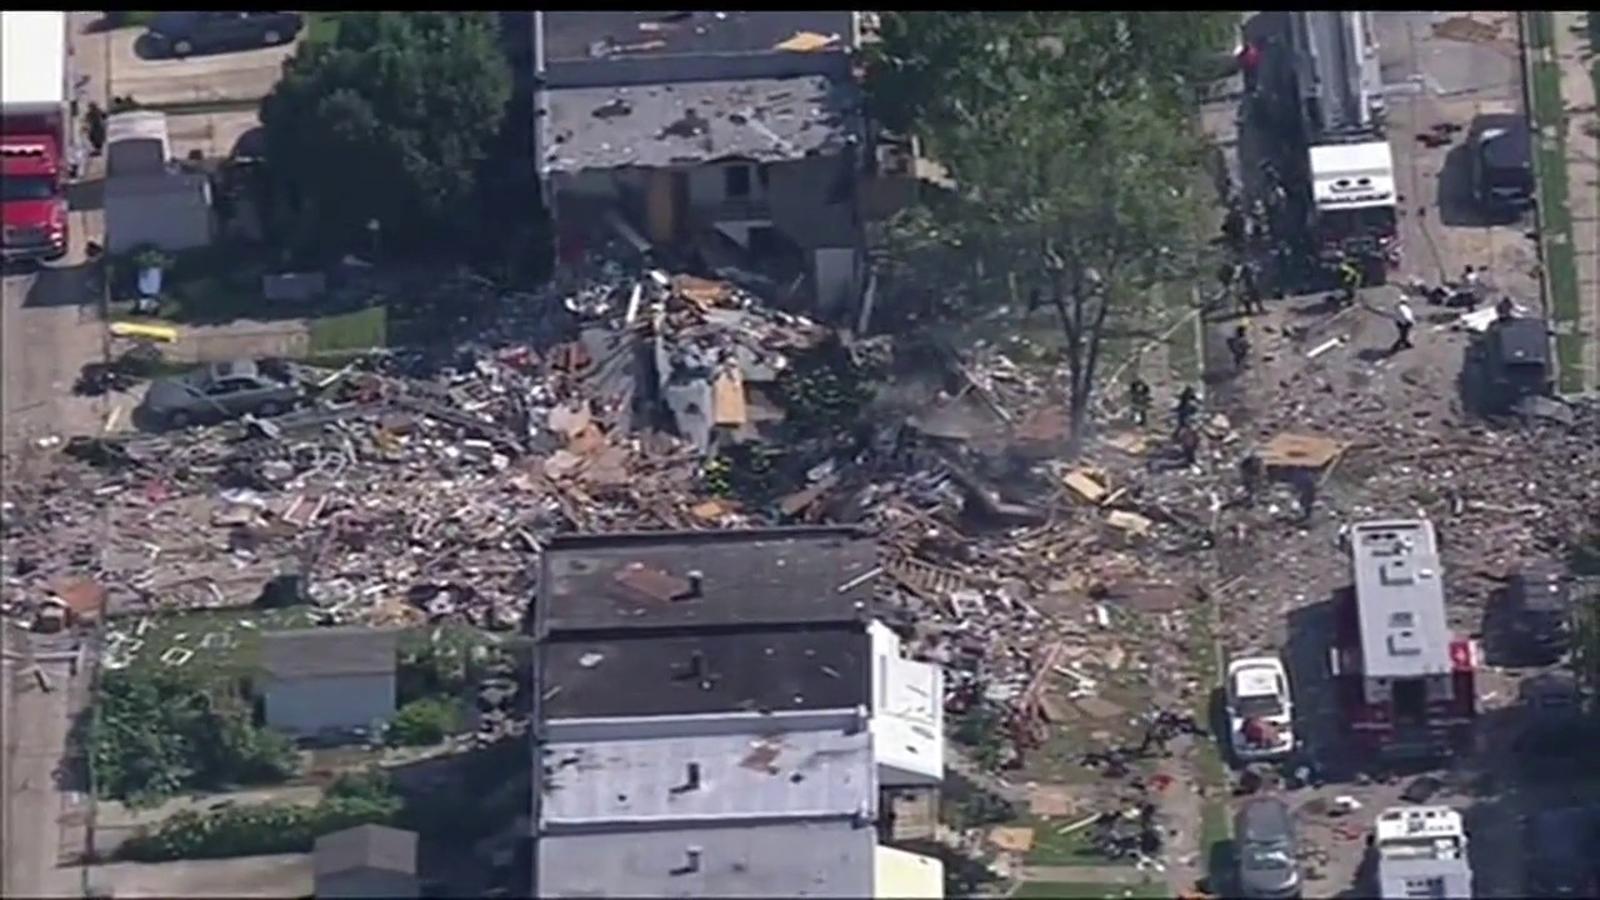 baltimore explosion - photo #5